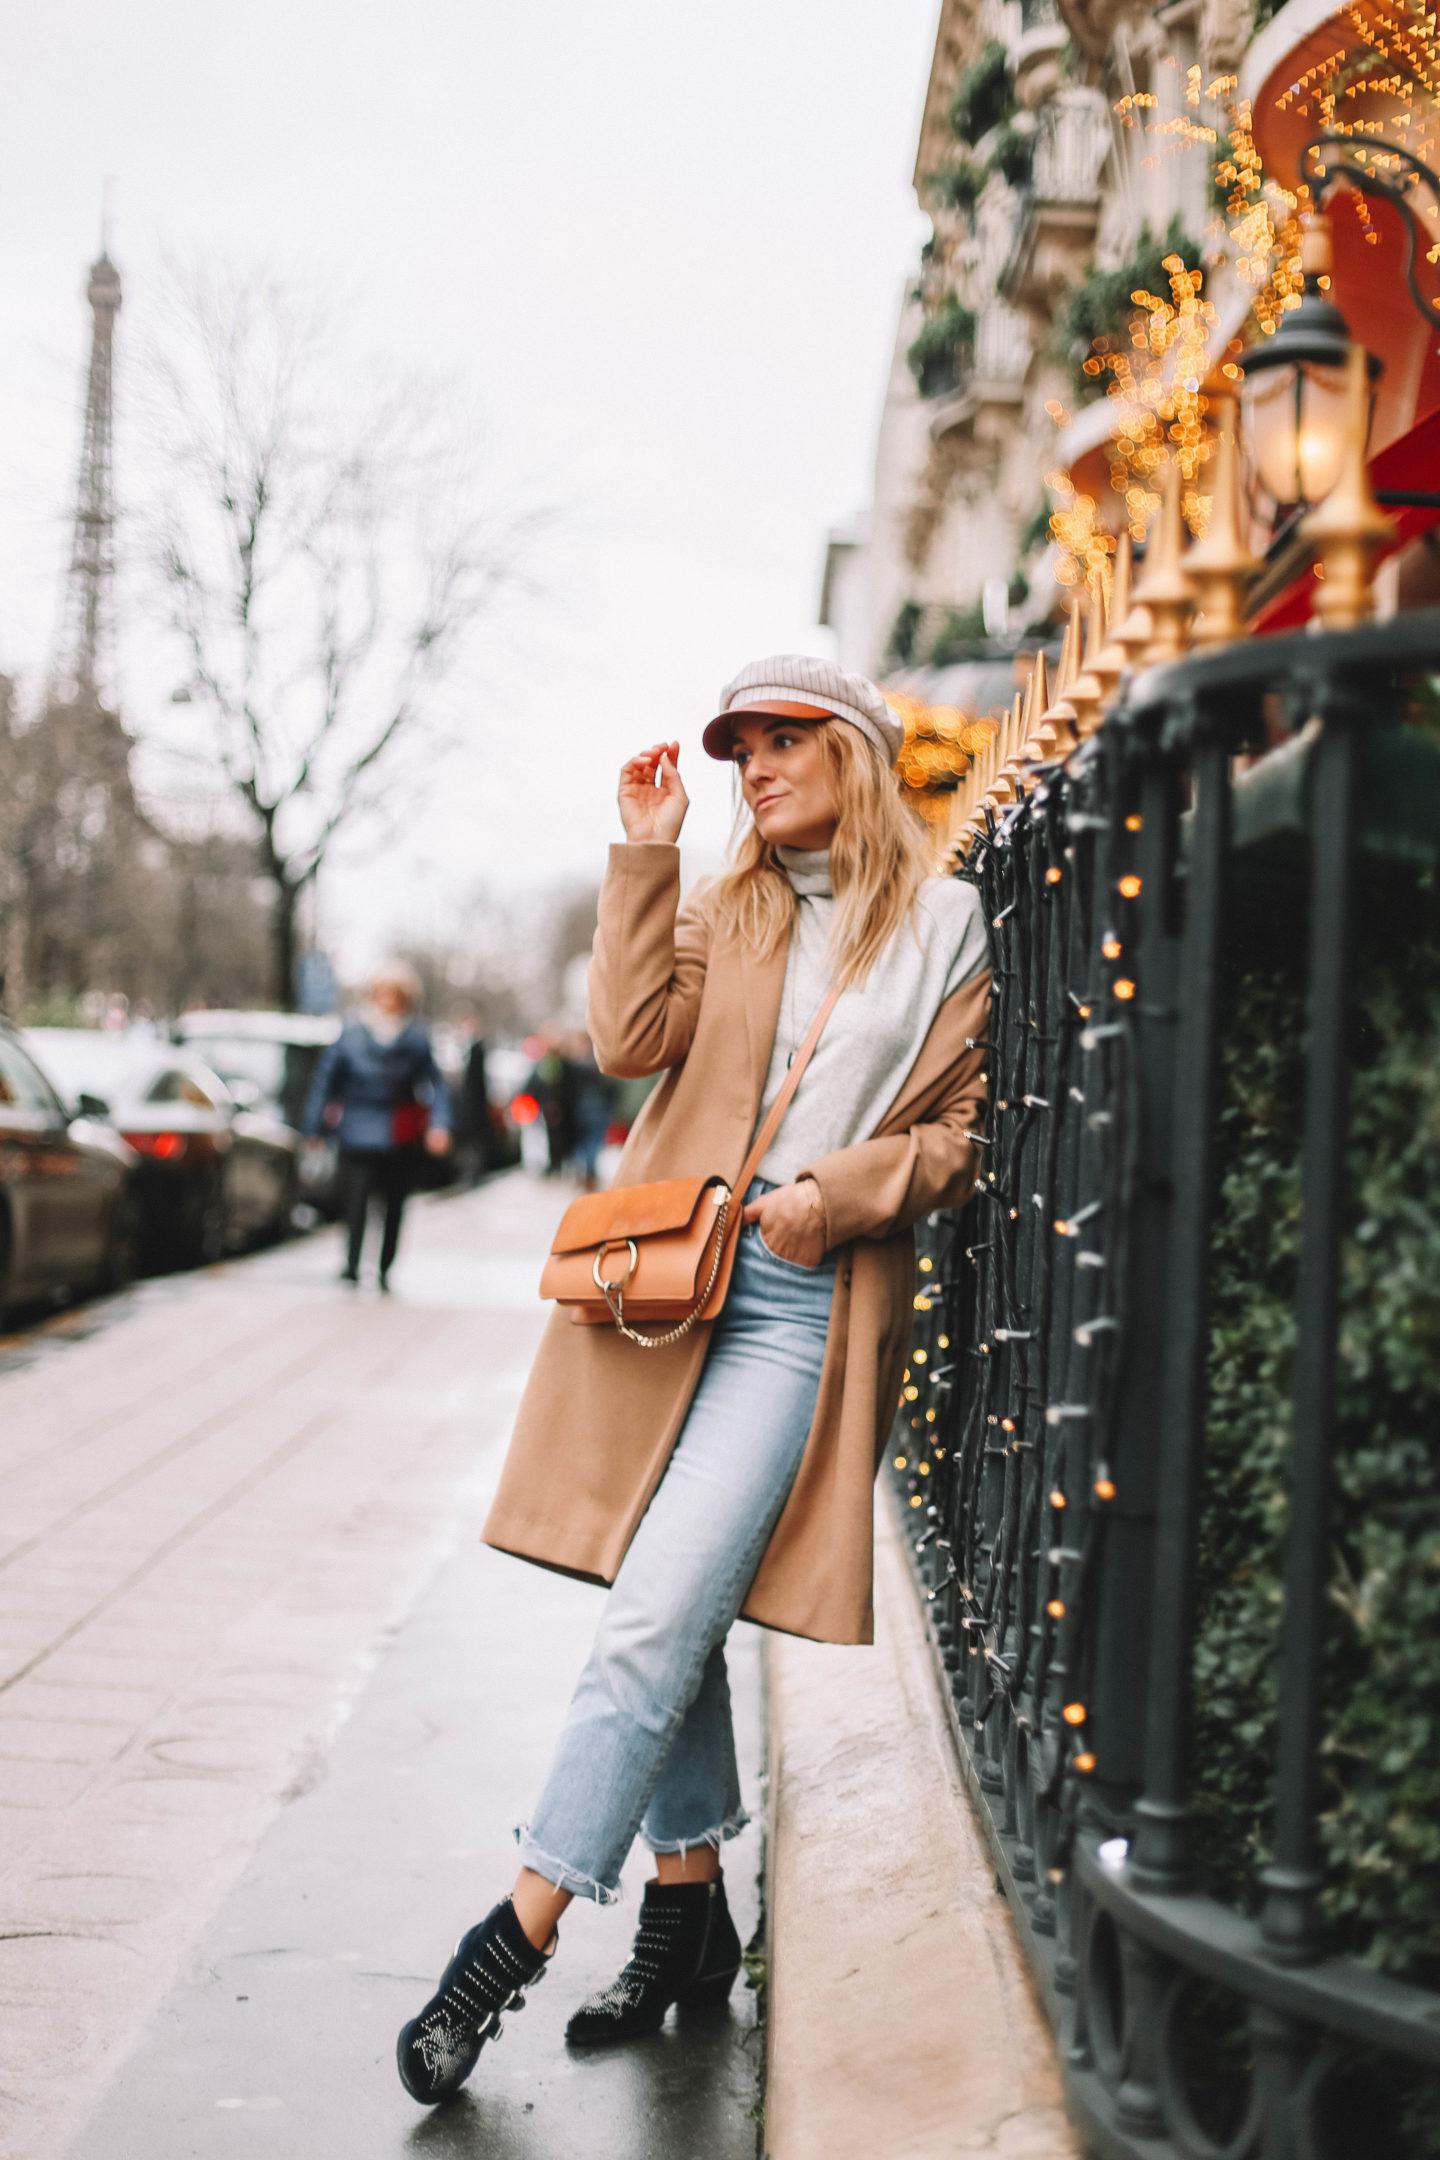 Jean Levi's - Blondie Baby blog mode et voyages